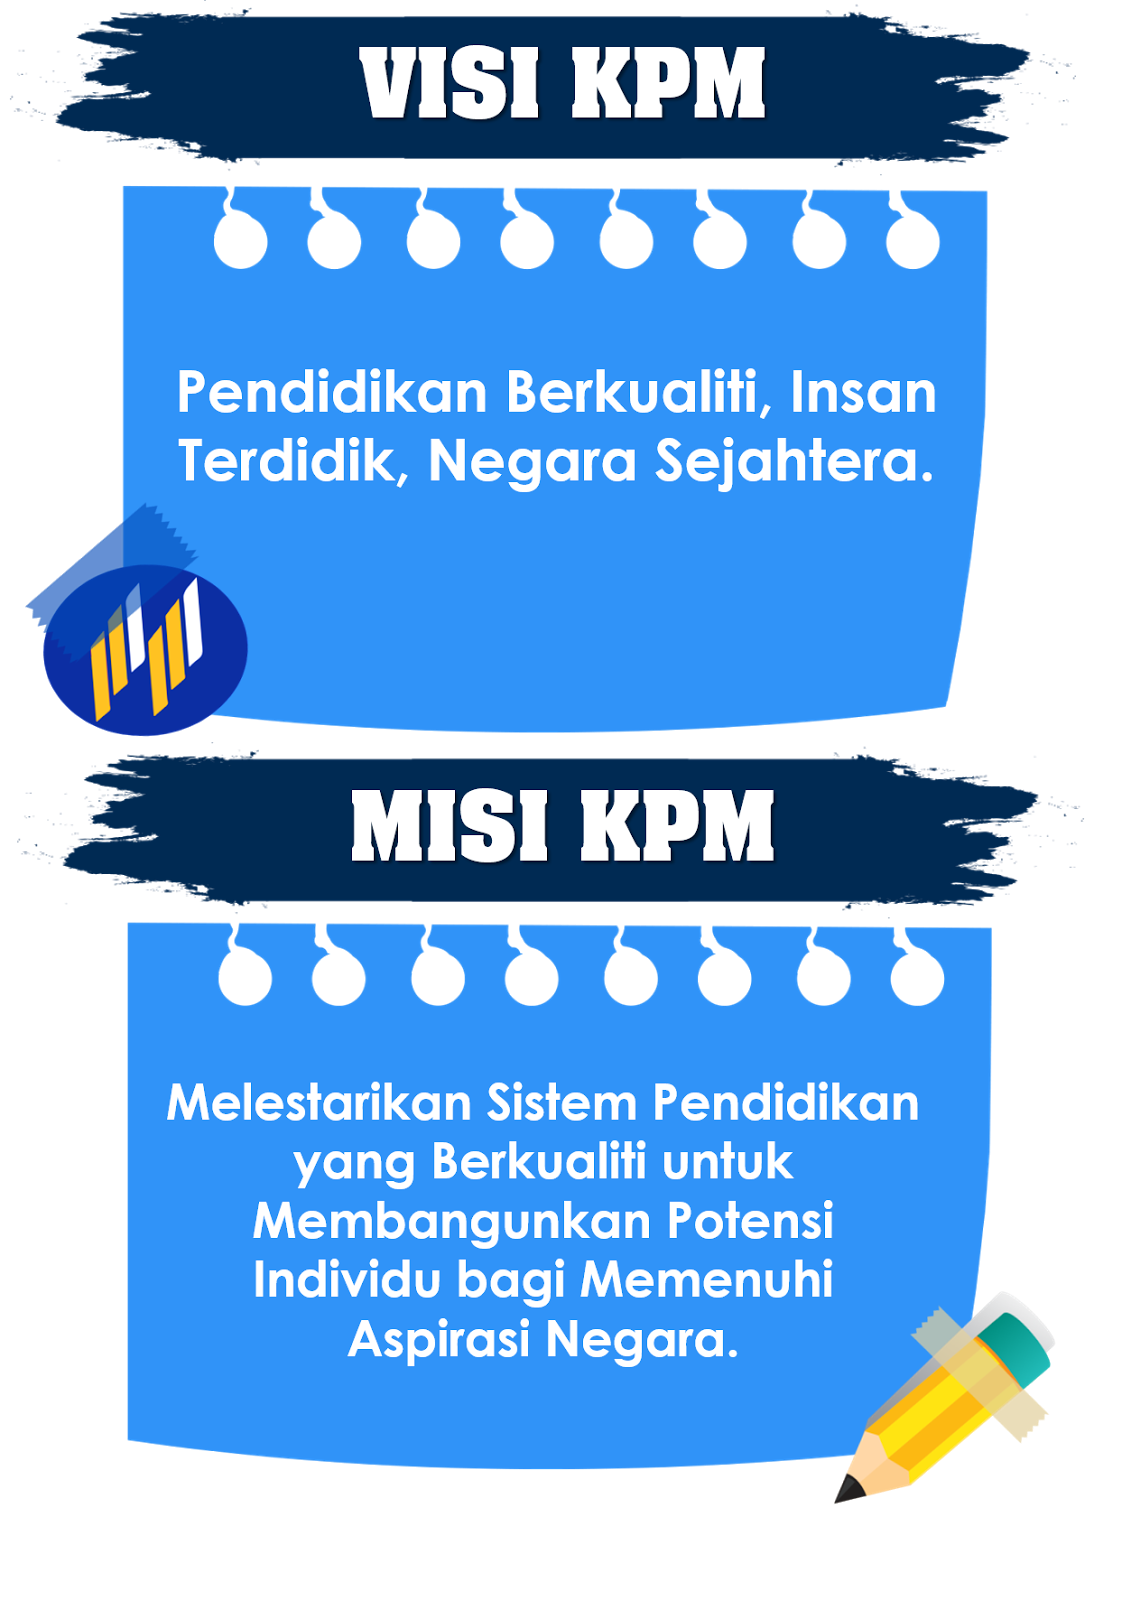 VISI & MISI KPM  MagOne 2016